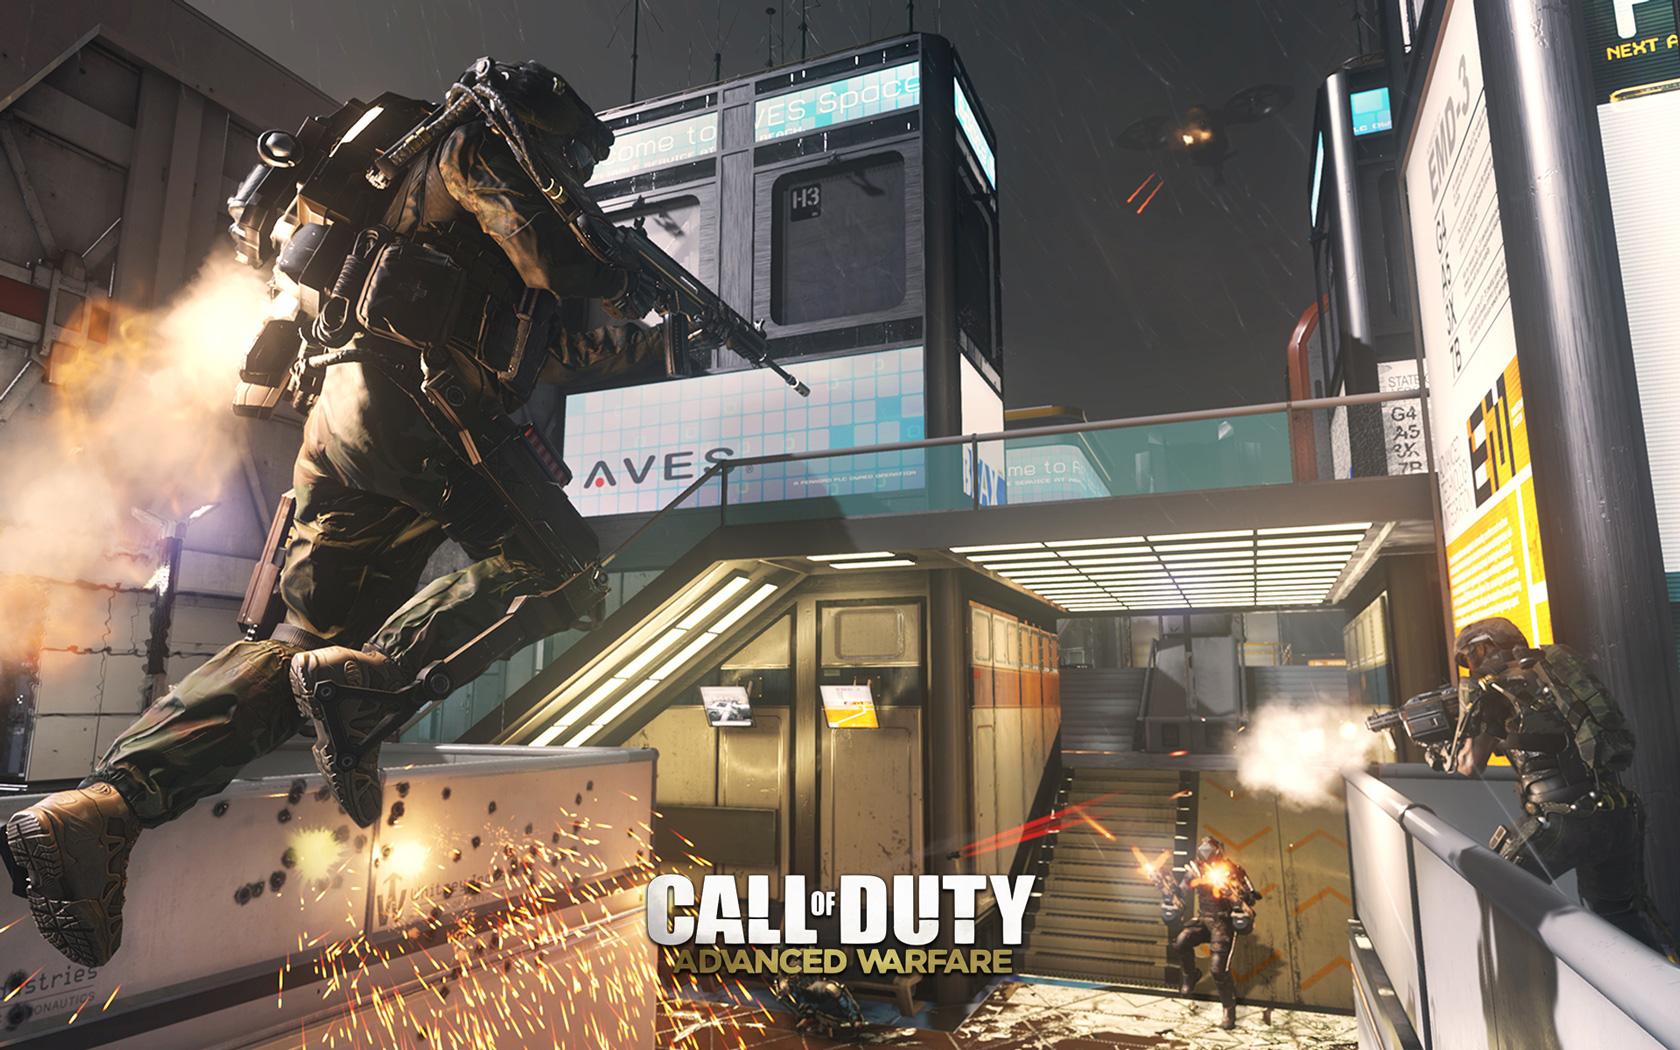 Free Call of Duty: Advanced Warfare Wallpaper in 1680x1050